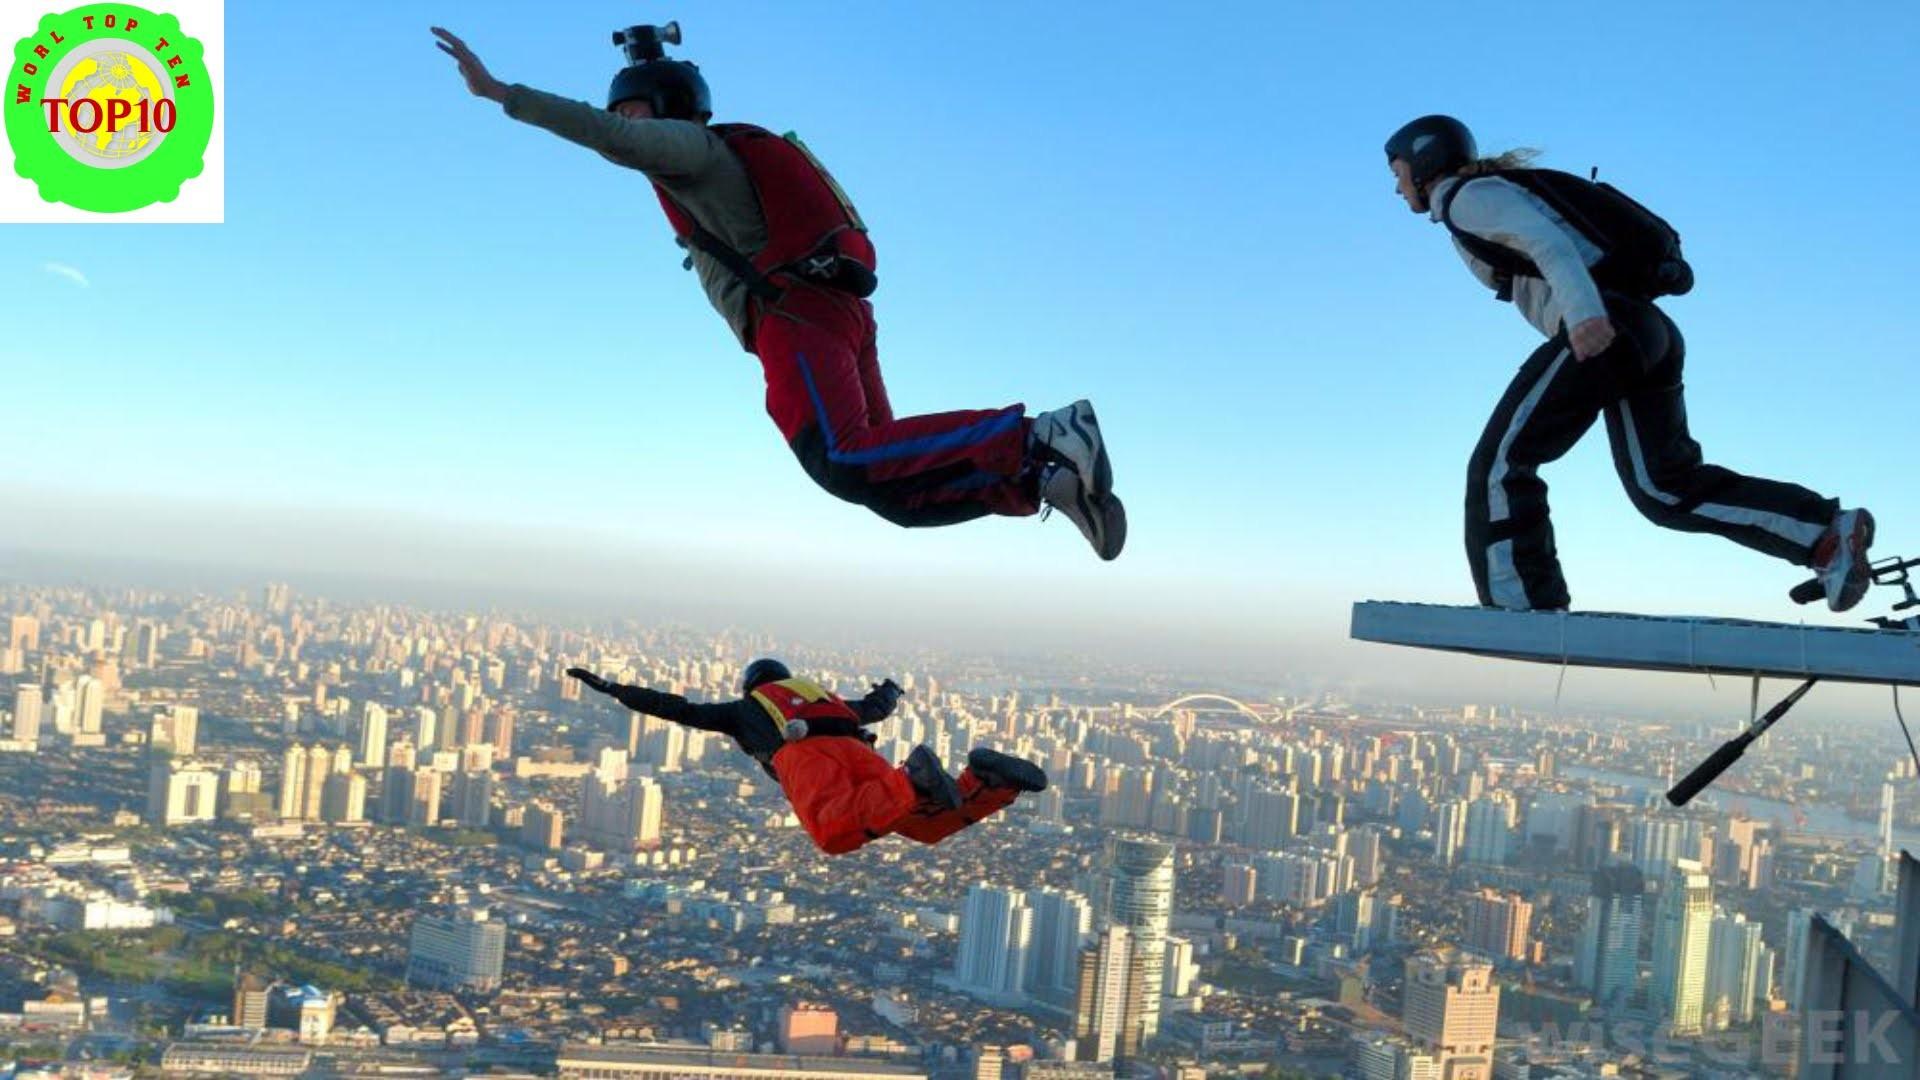 World's Most Dangerous Sports Events